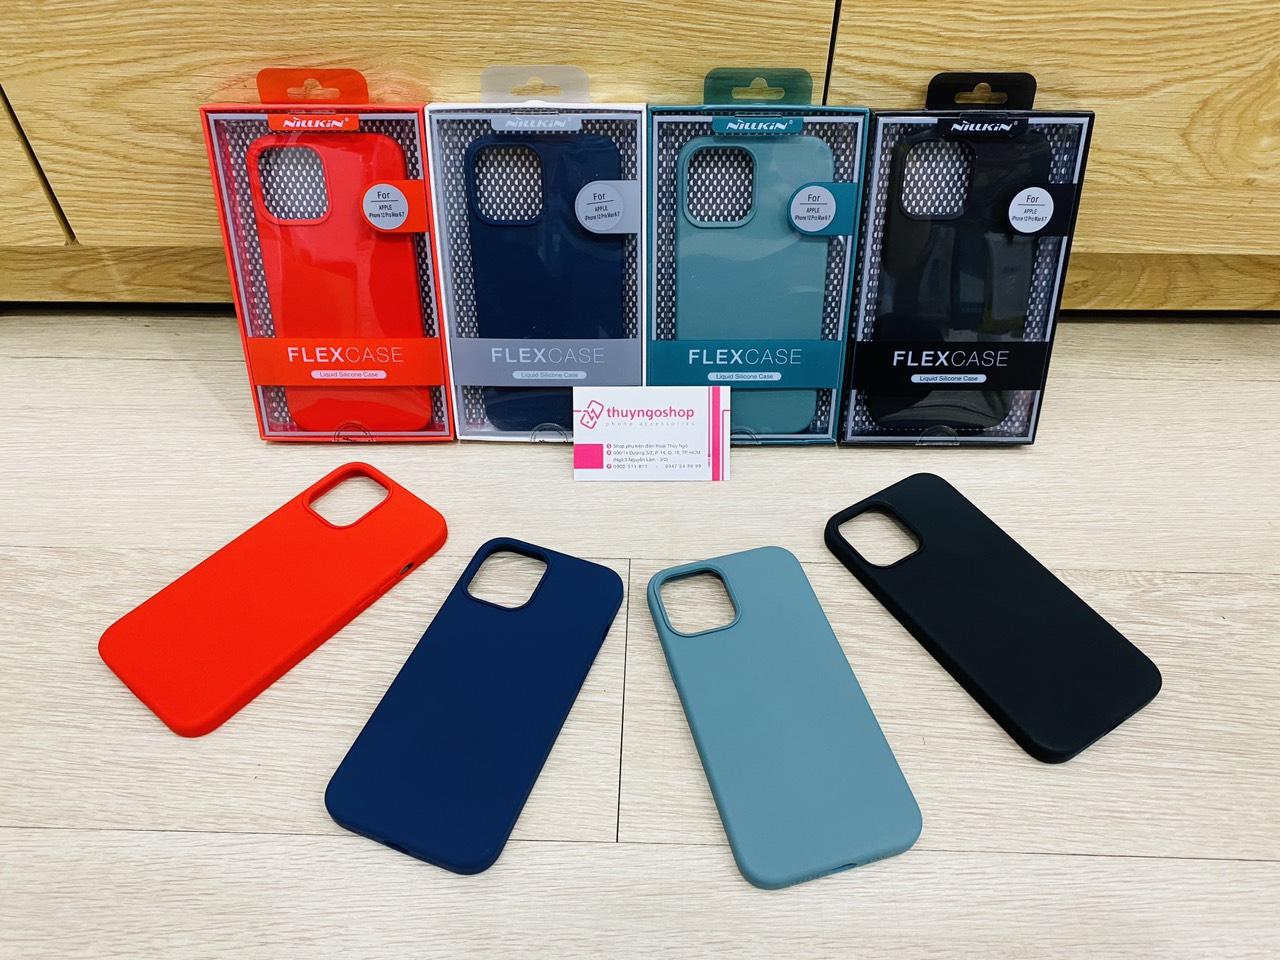 Ốp chống bẩn Nillkin Flex Pure - Iphone 12 / 12 Pro